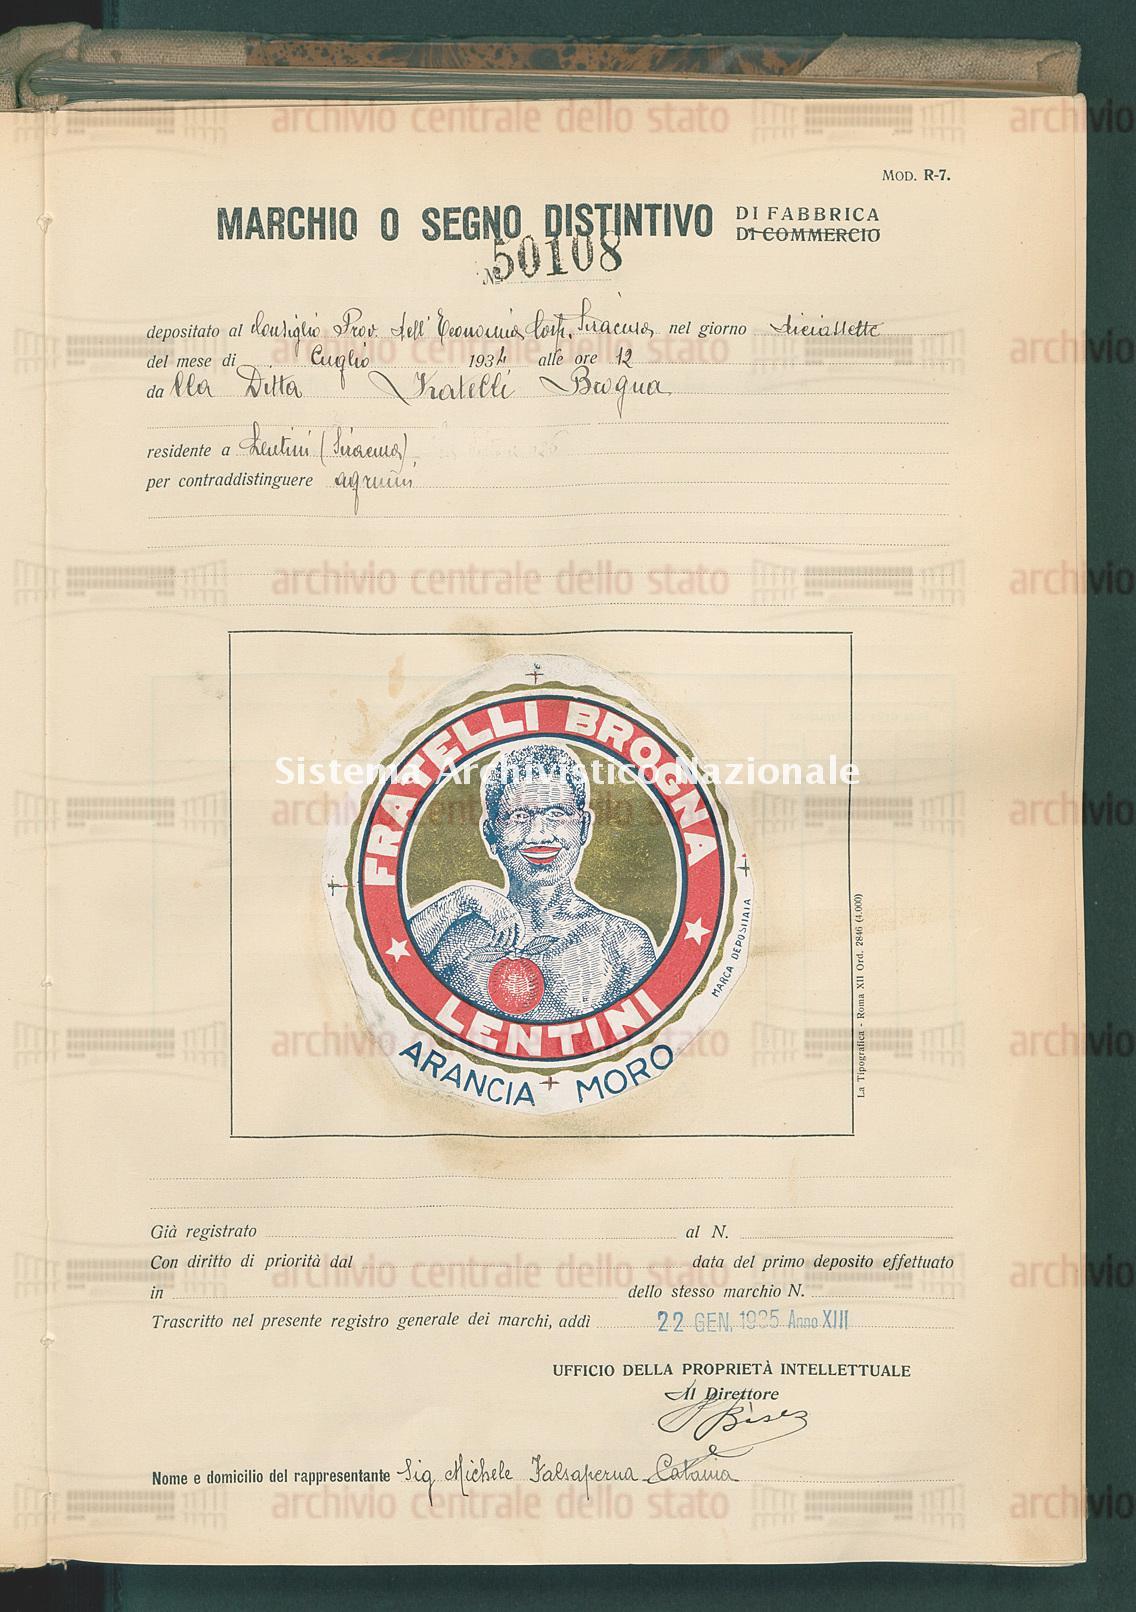 Agrumi Ditta Fratelli Brogna (22/01/1935)